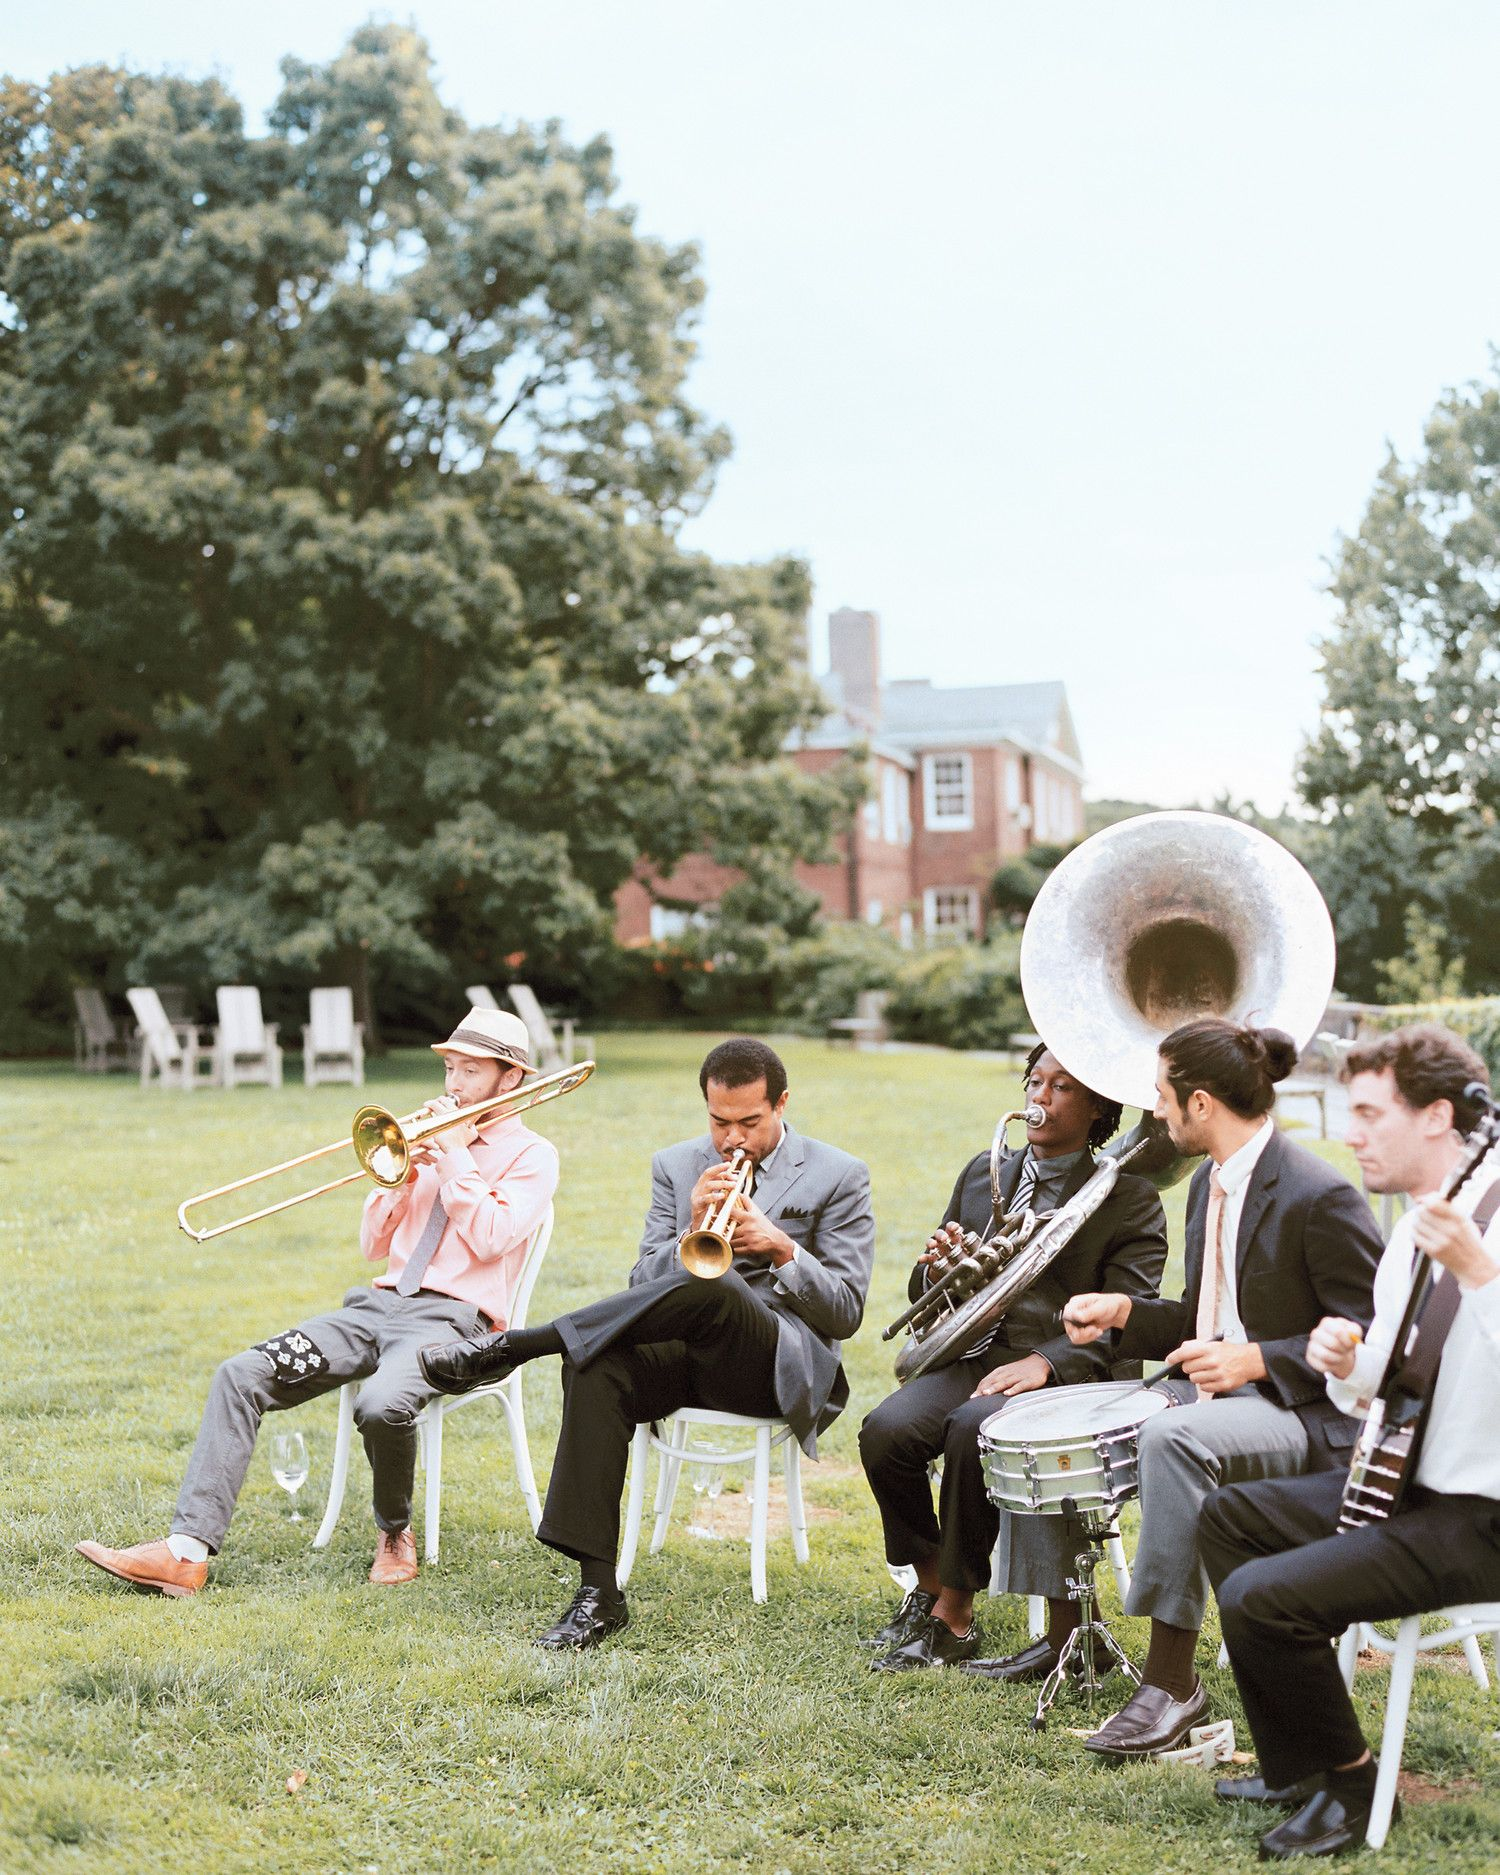 A Fashionable Garden Party Style Wedding In New York City Summer Wedding Venues Circus Wedding Wedding News